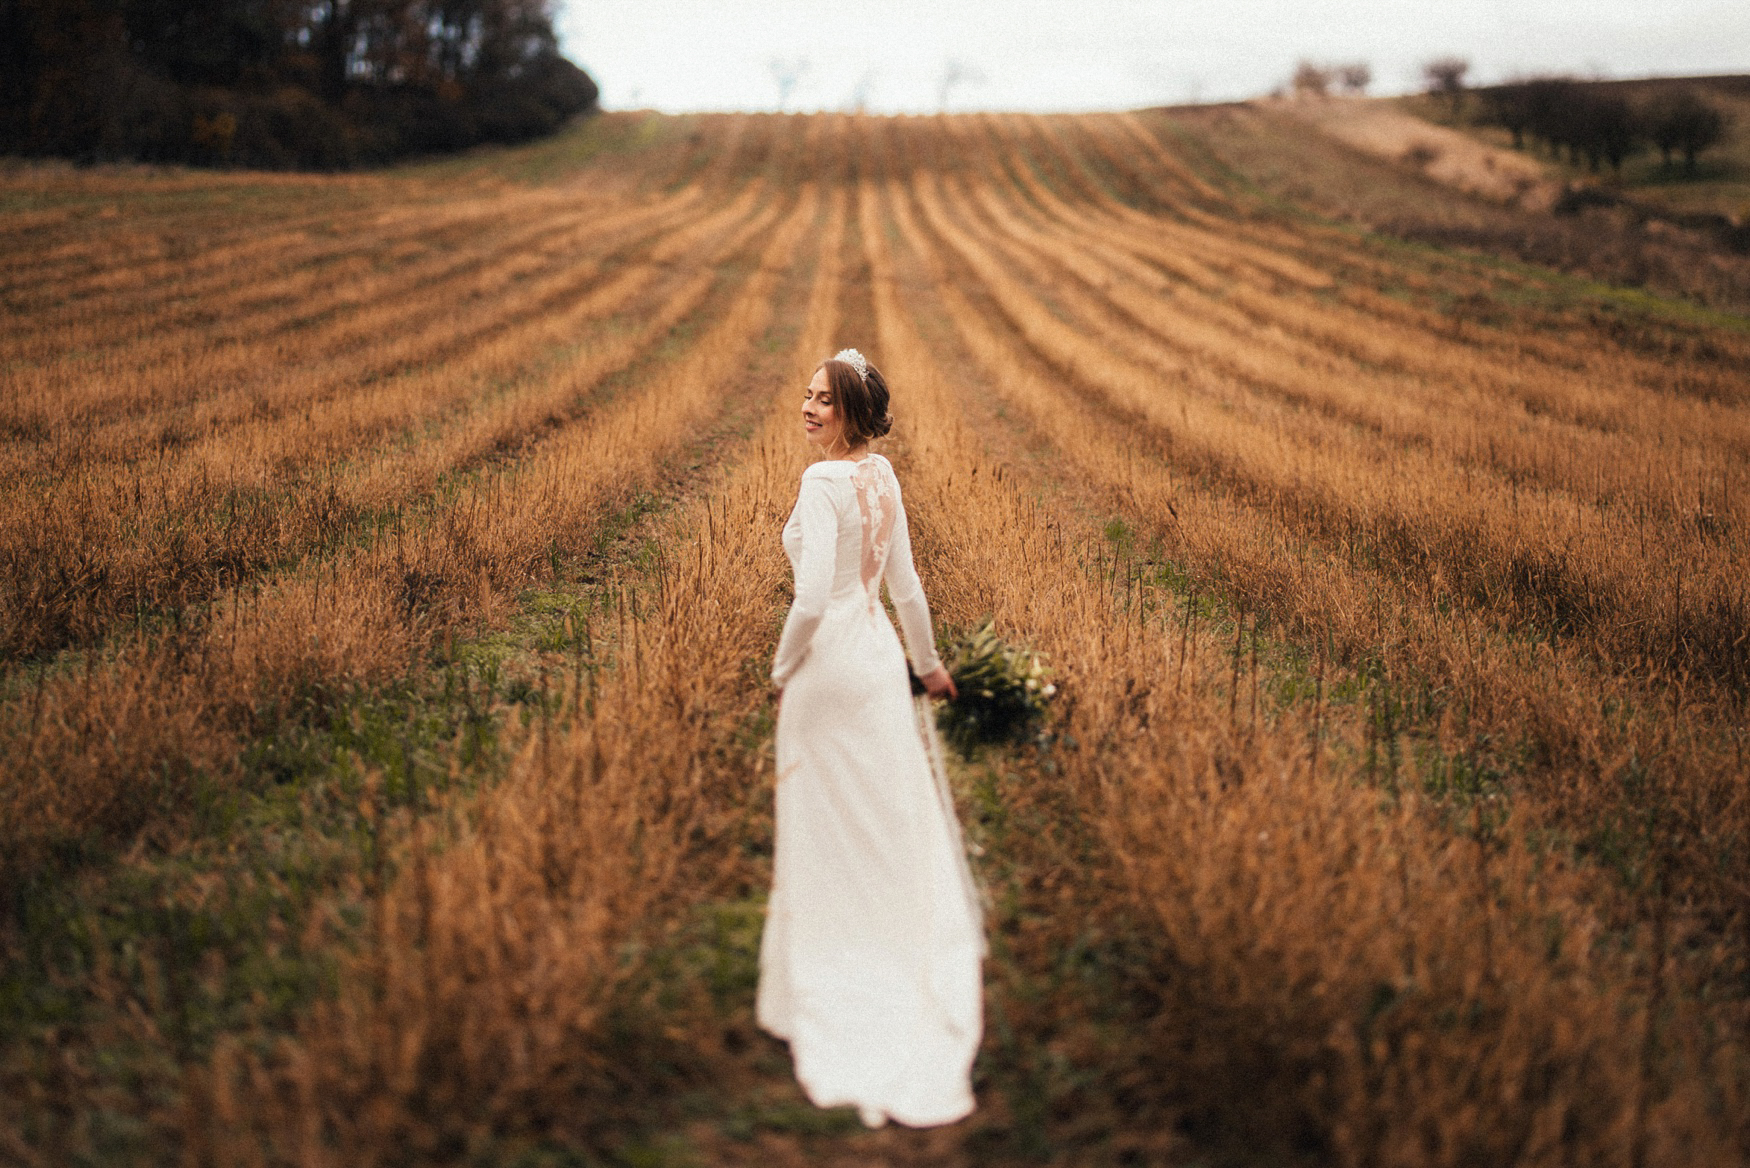 3 czech countryside rustic wedding - svatba zikmundov013.jpg